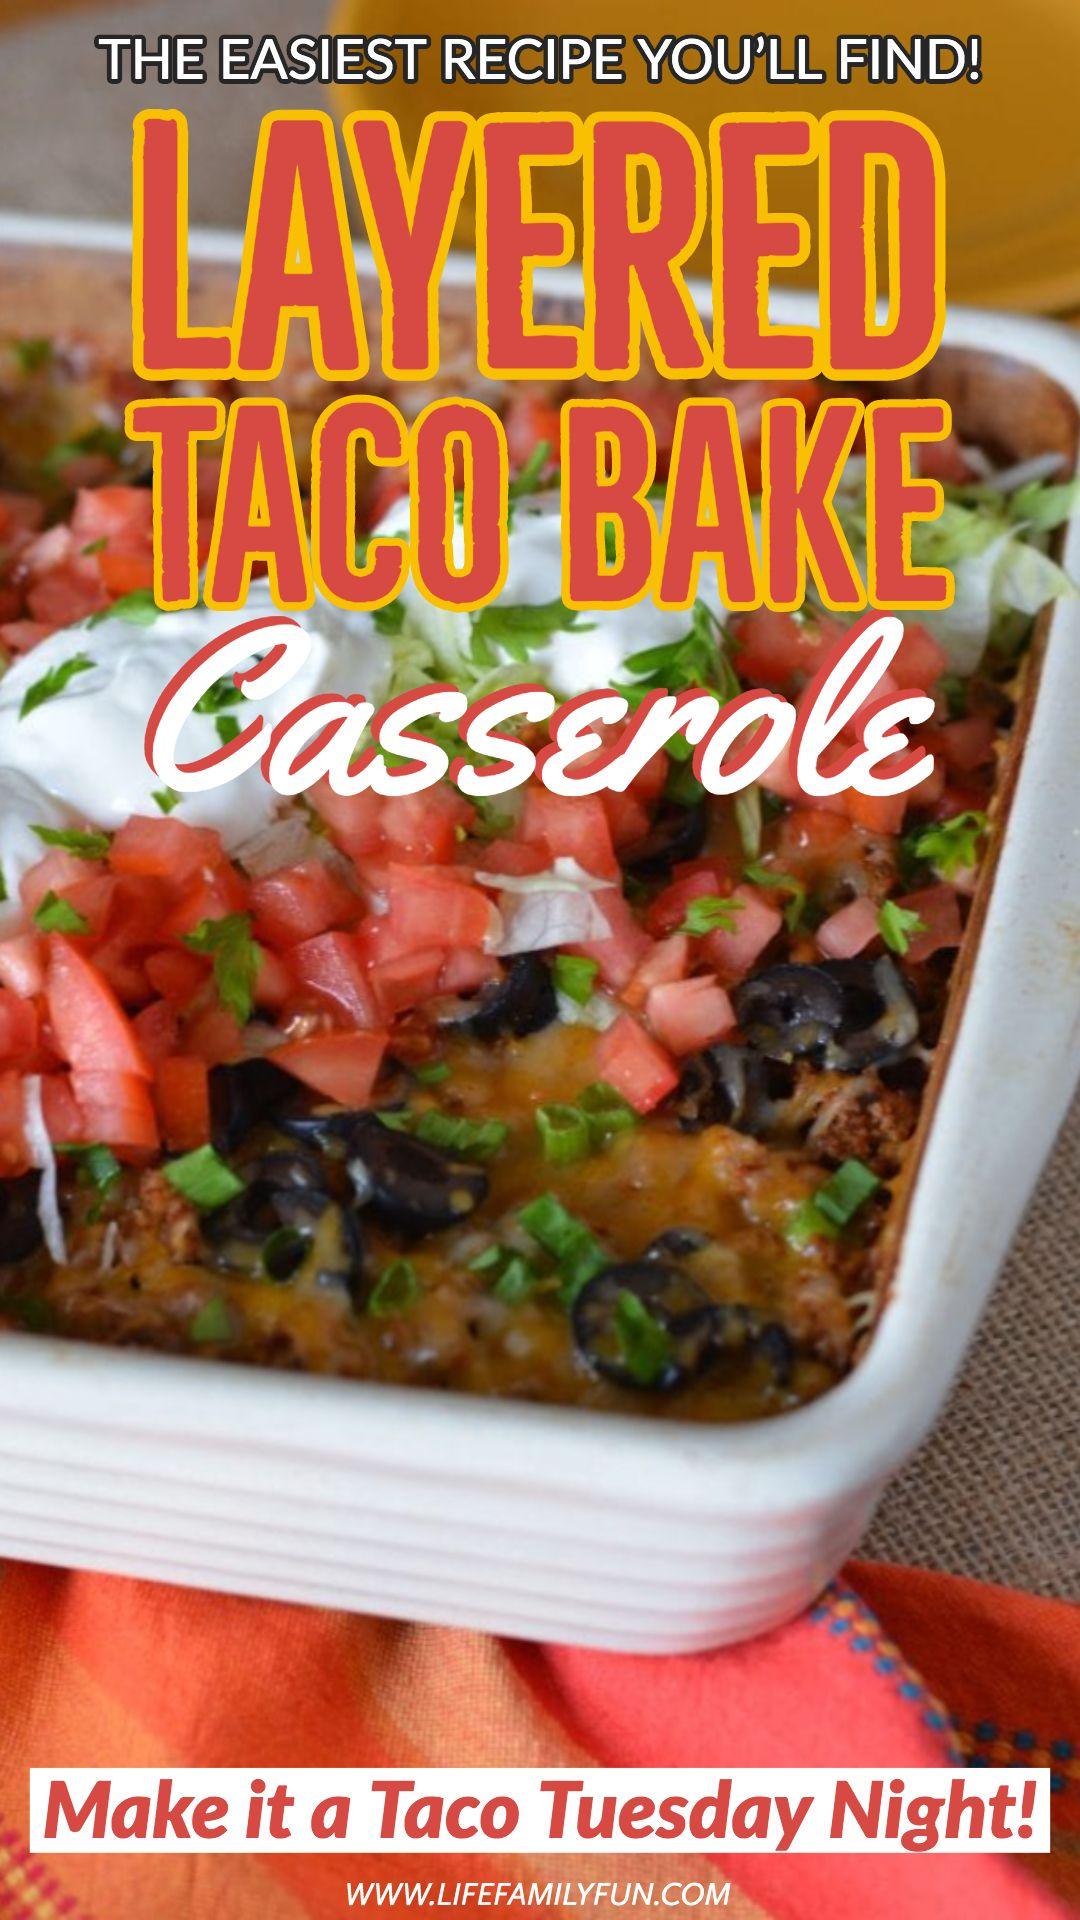 Layered Taco Bake Casserole - Make It A Taco Tuesday Night